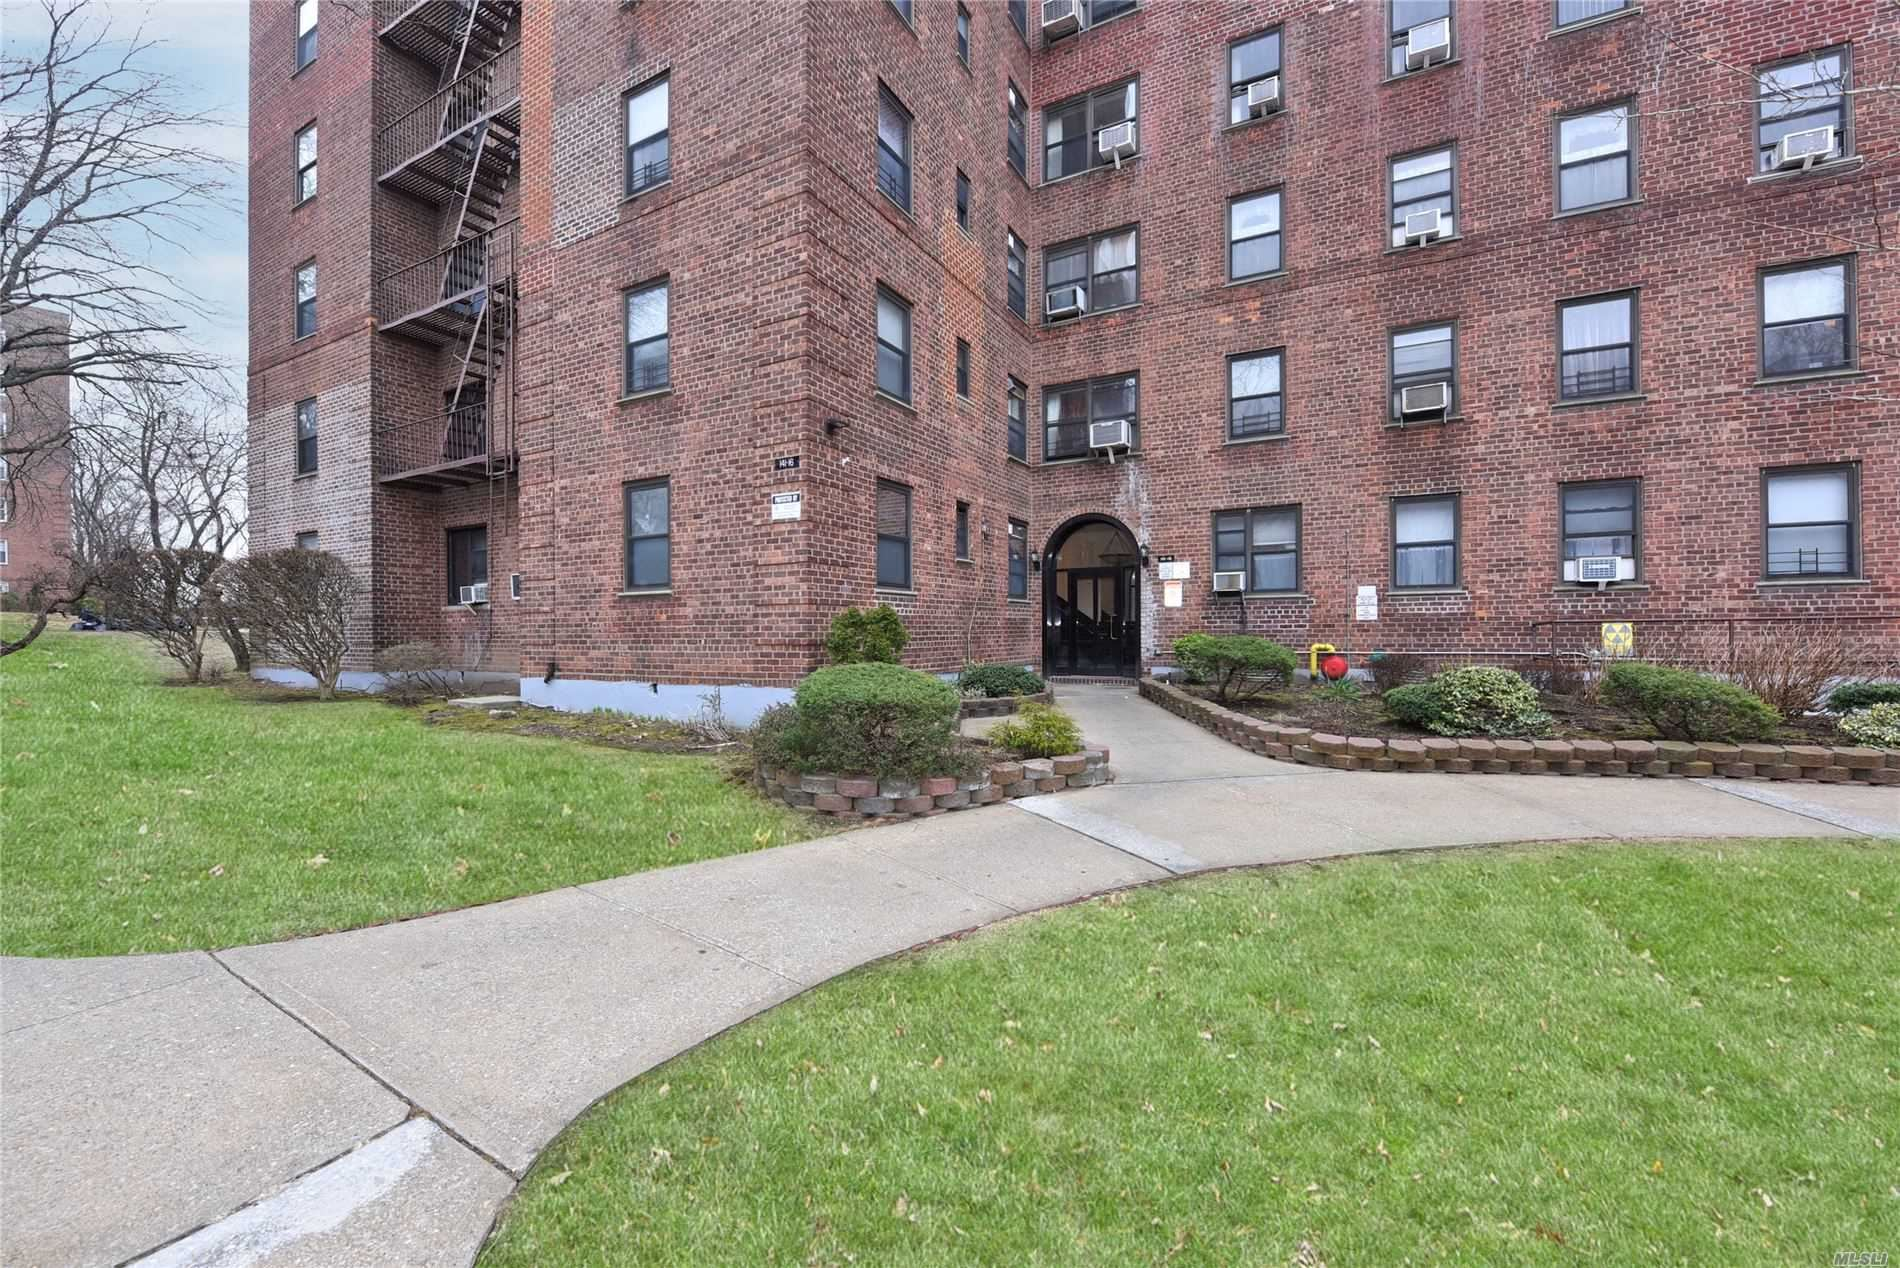 141-10 28th Avenue #6F, Flushing, NY 11354 - MLS#: 3201740